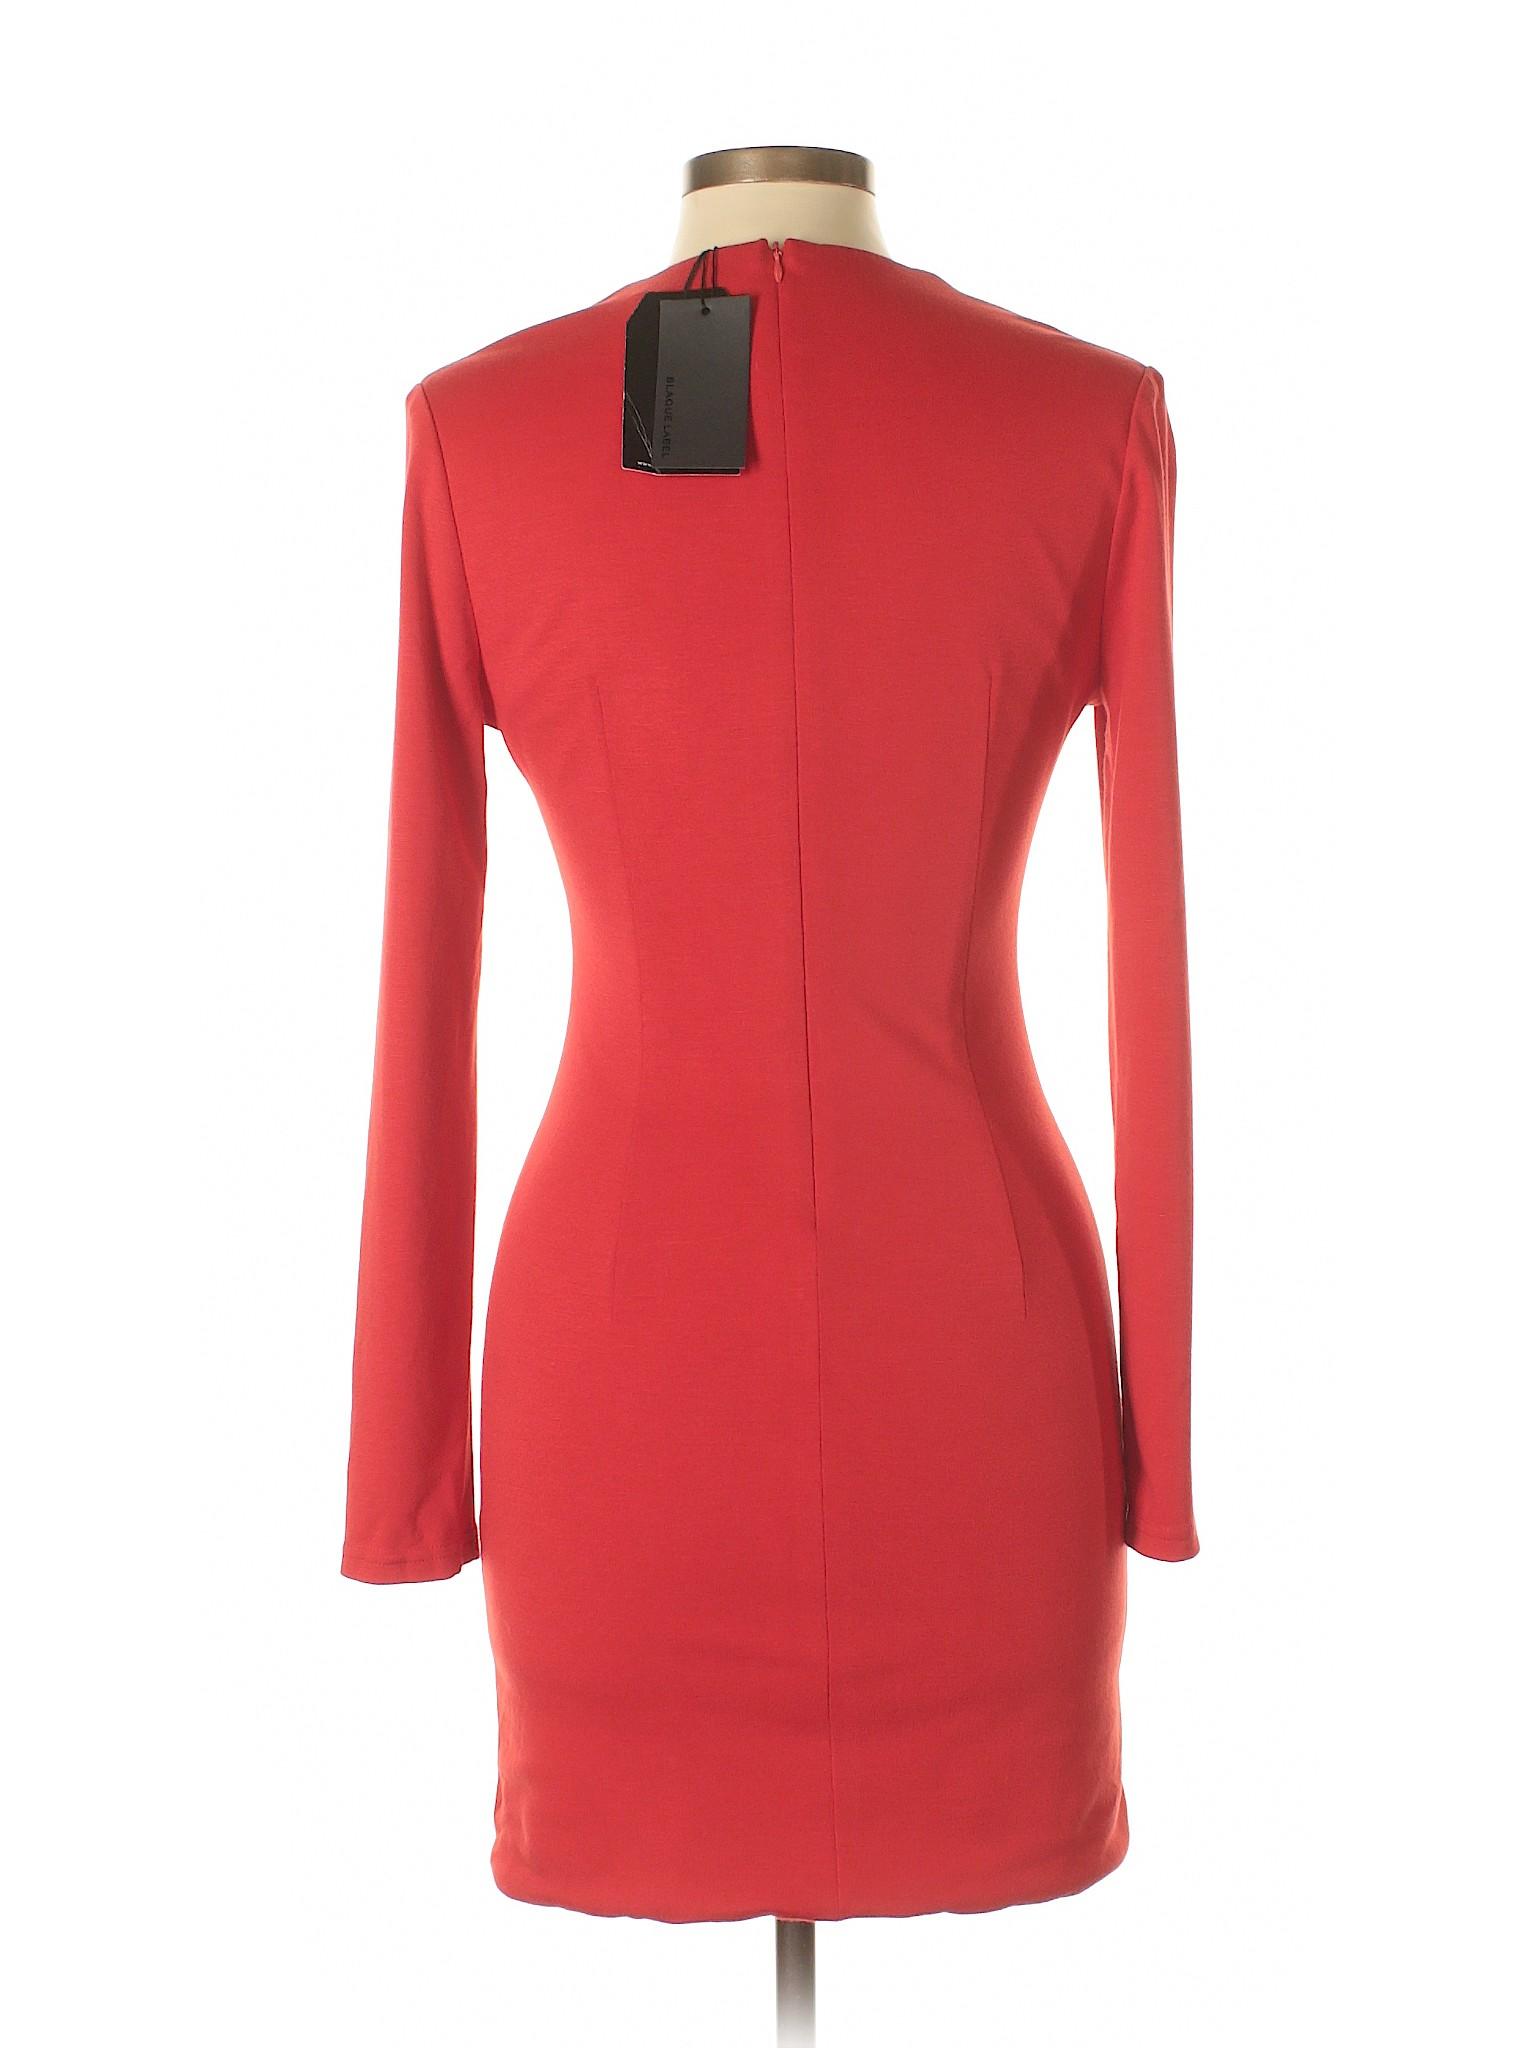 Boutique winter Dress Casual Blaque Label BxqgrYwBX